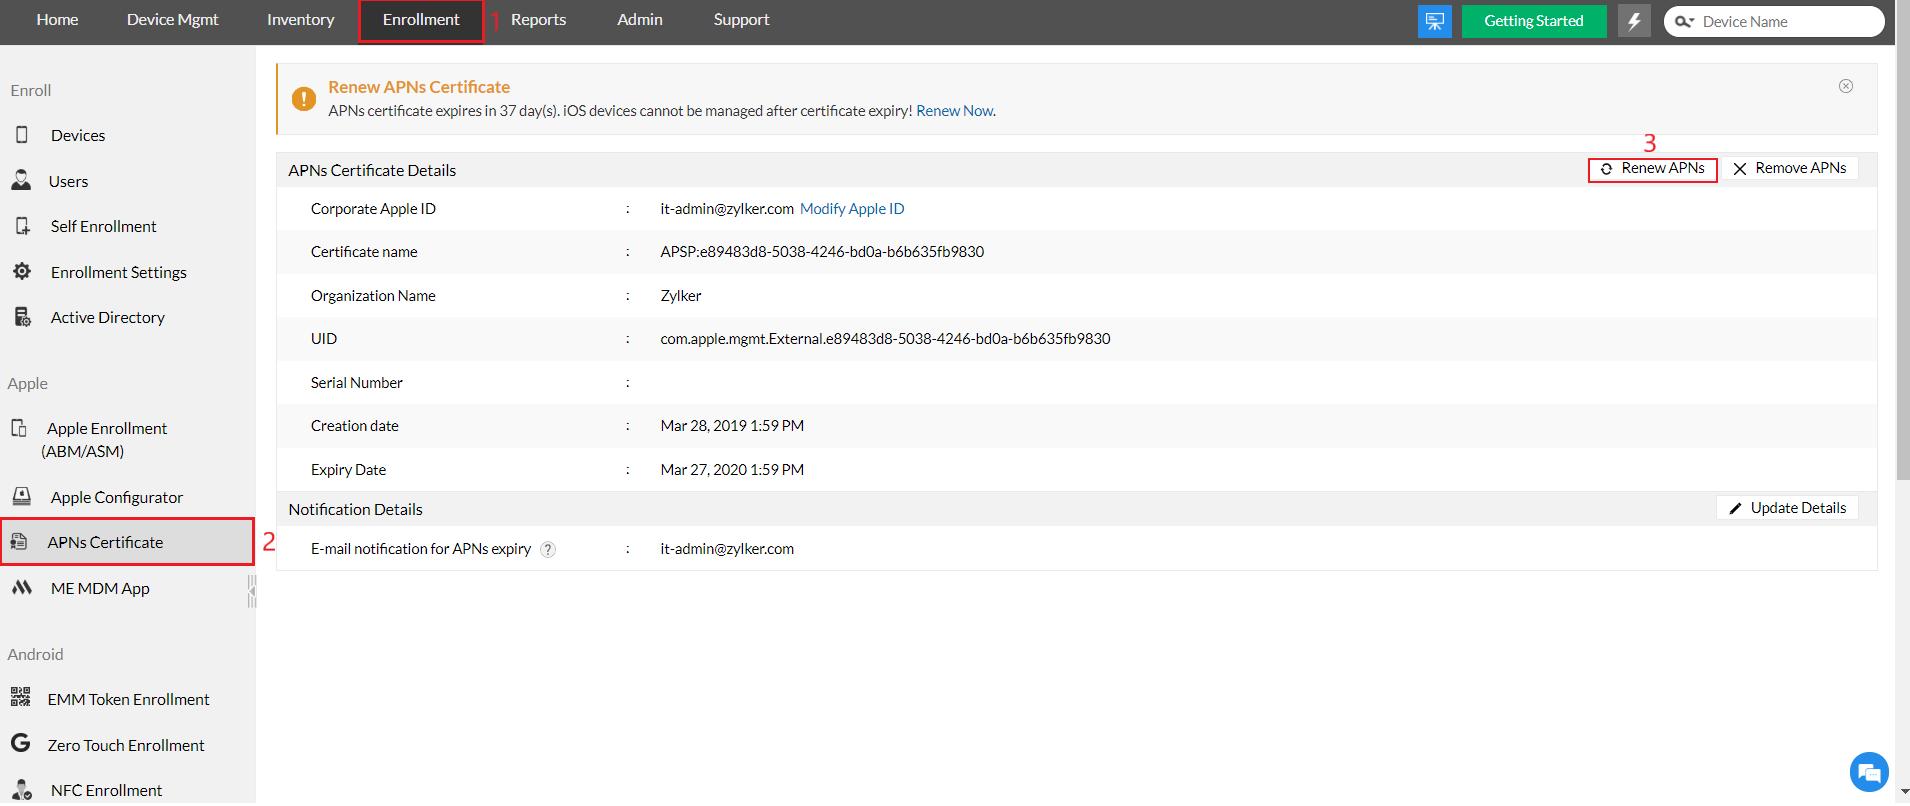 Renew APNs certificate Message on MDM server